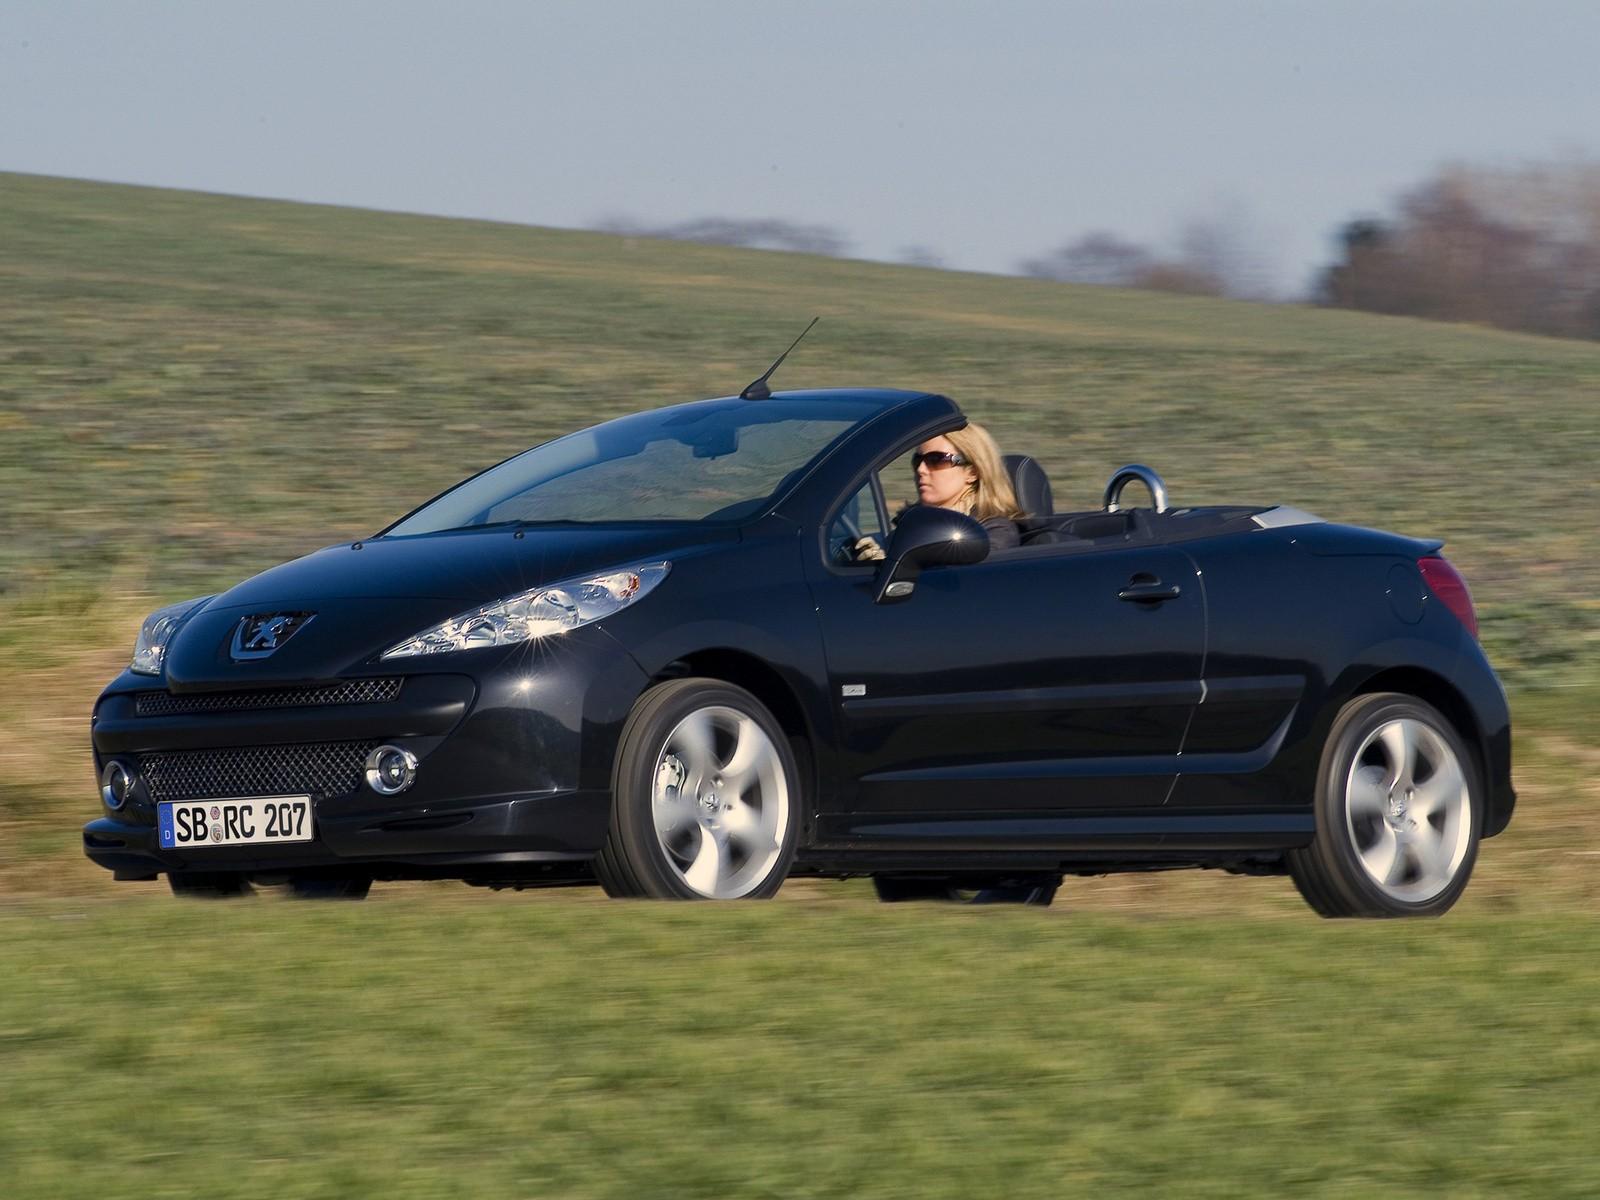 peugeot 207 cc specs - 2007, 2008, 2009 - autoevolution